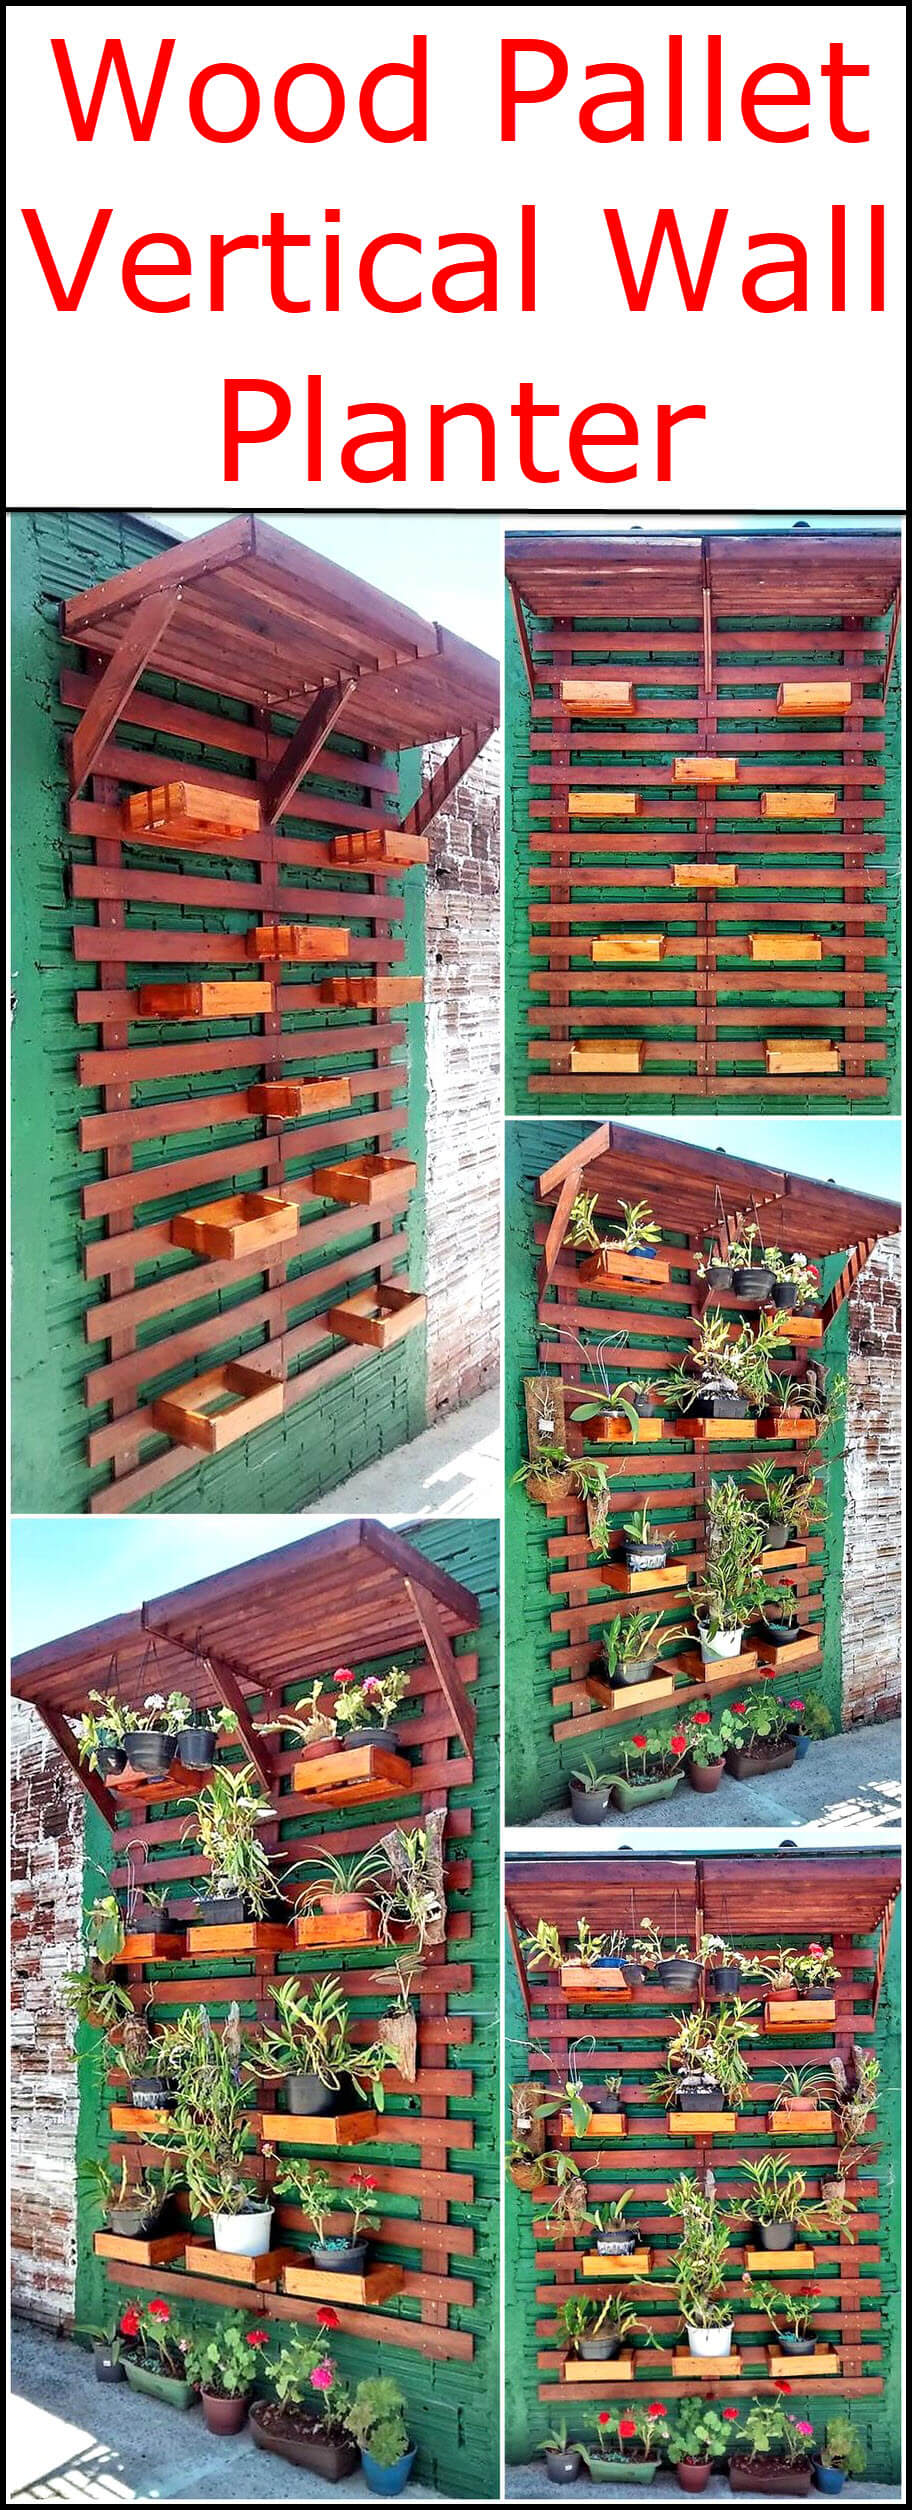 Wood Pallet Vertical Wall Planter